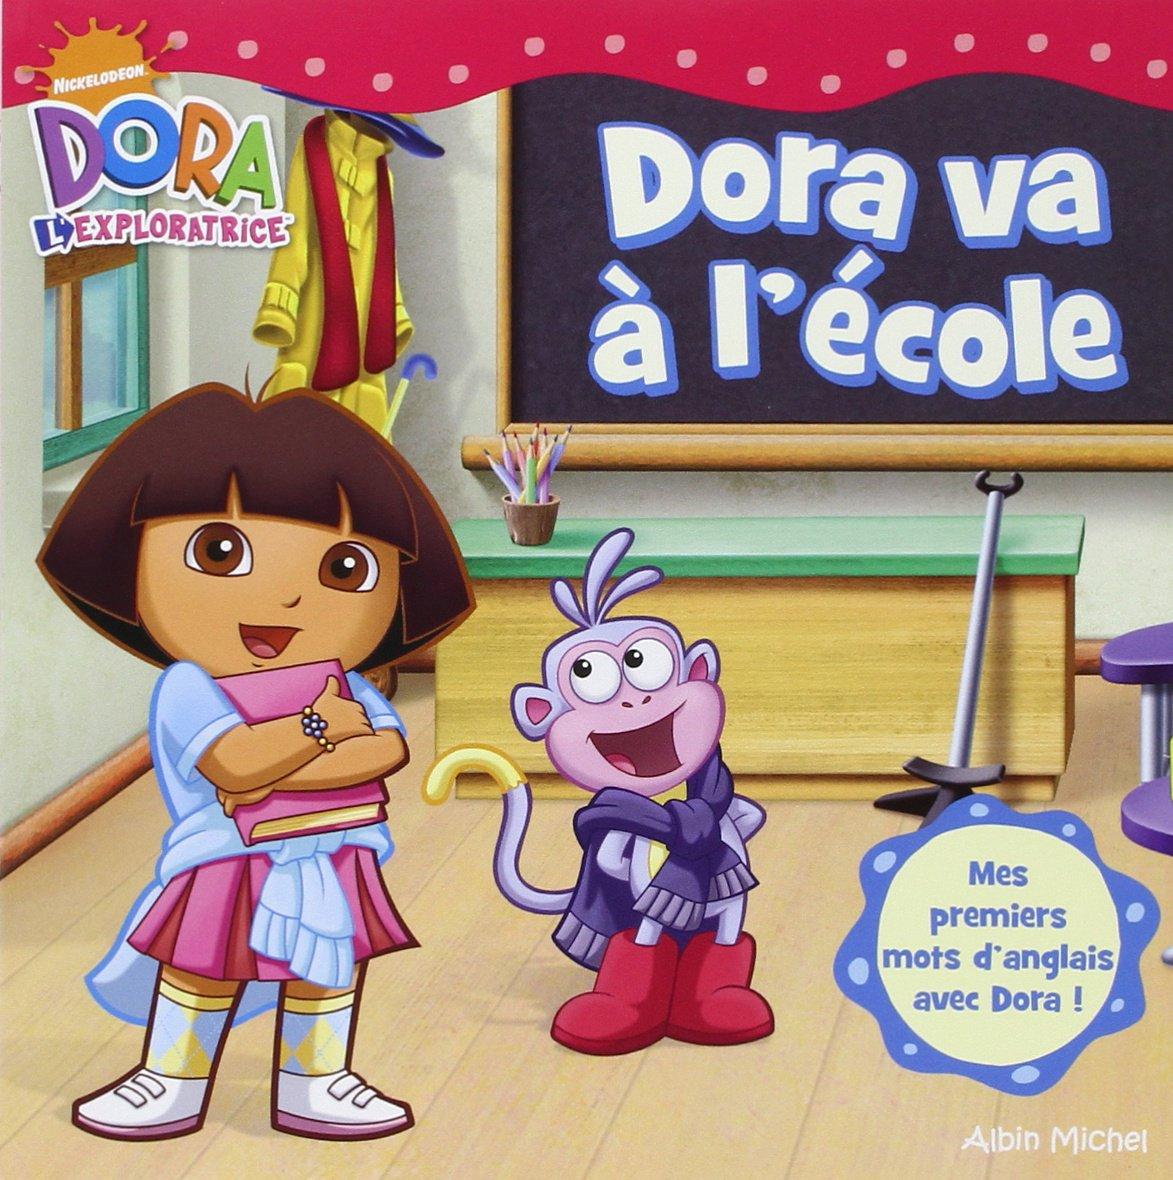 Dora Va a L'ecole (French Edition) pdf epub